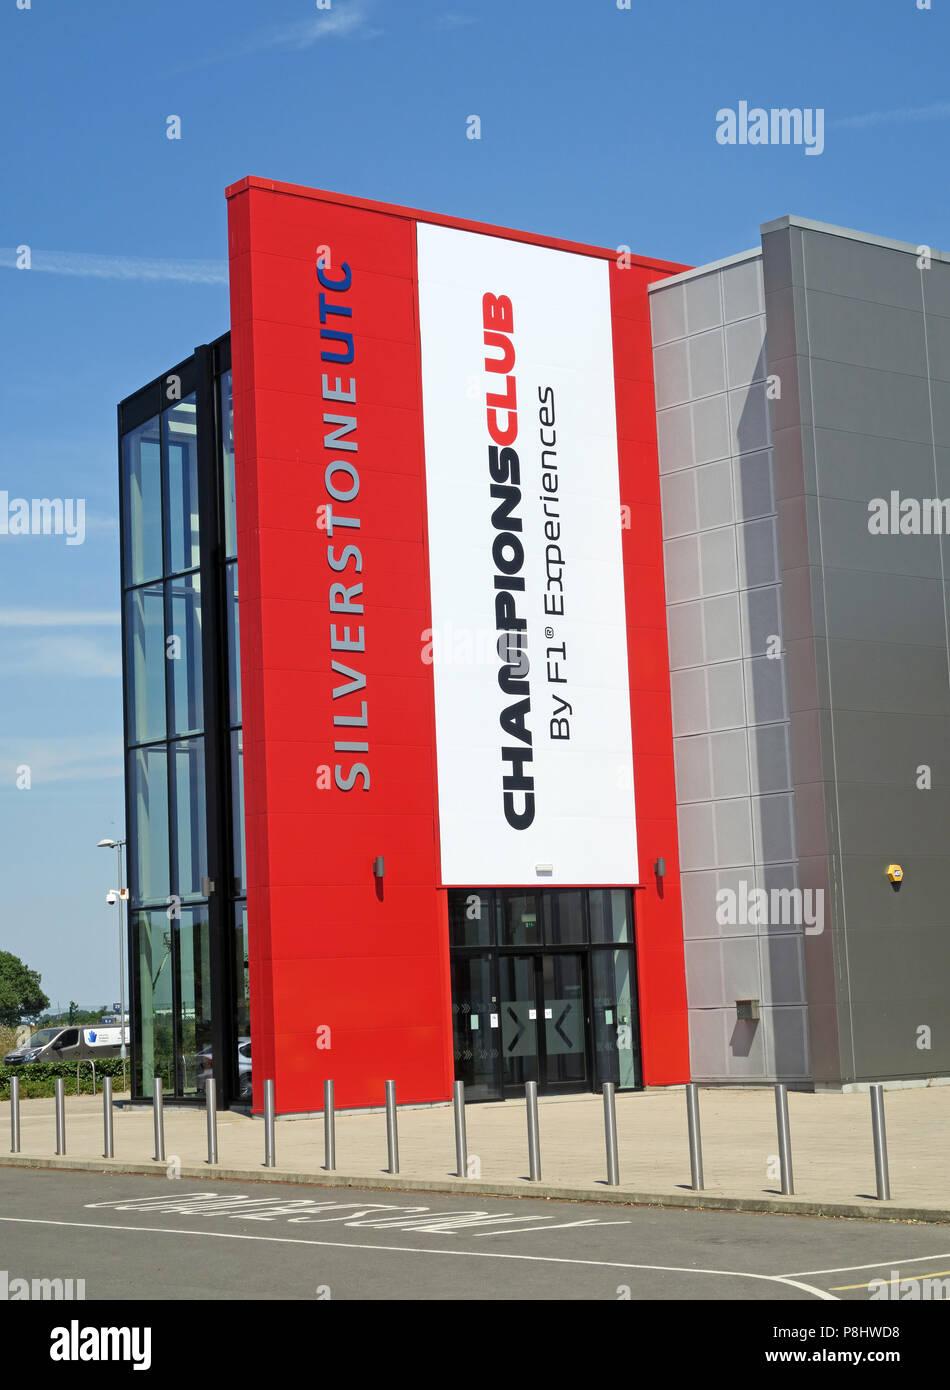 Dieses Stockfoto: Silverstone UTC ChampionsClub, F1 Erfahrungen Technology Center, Silverstone Circuit, Silverstone, Towcester, Northamptonshire, UK, NN12 8TL - P8HWD8